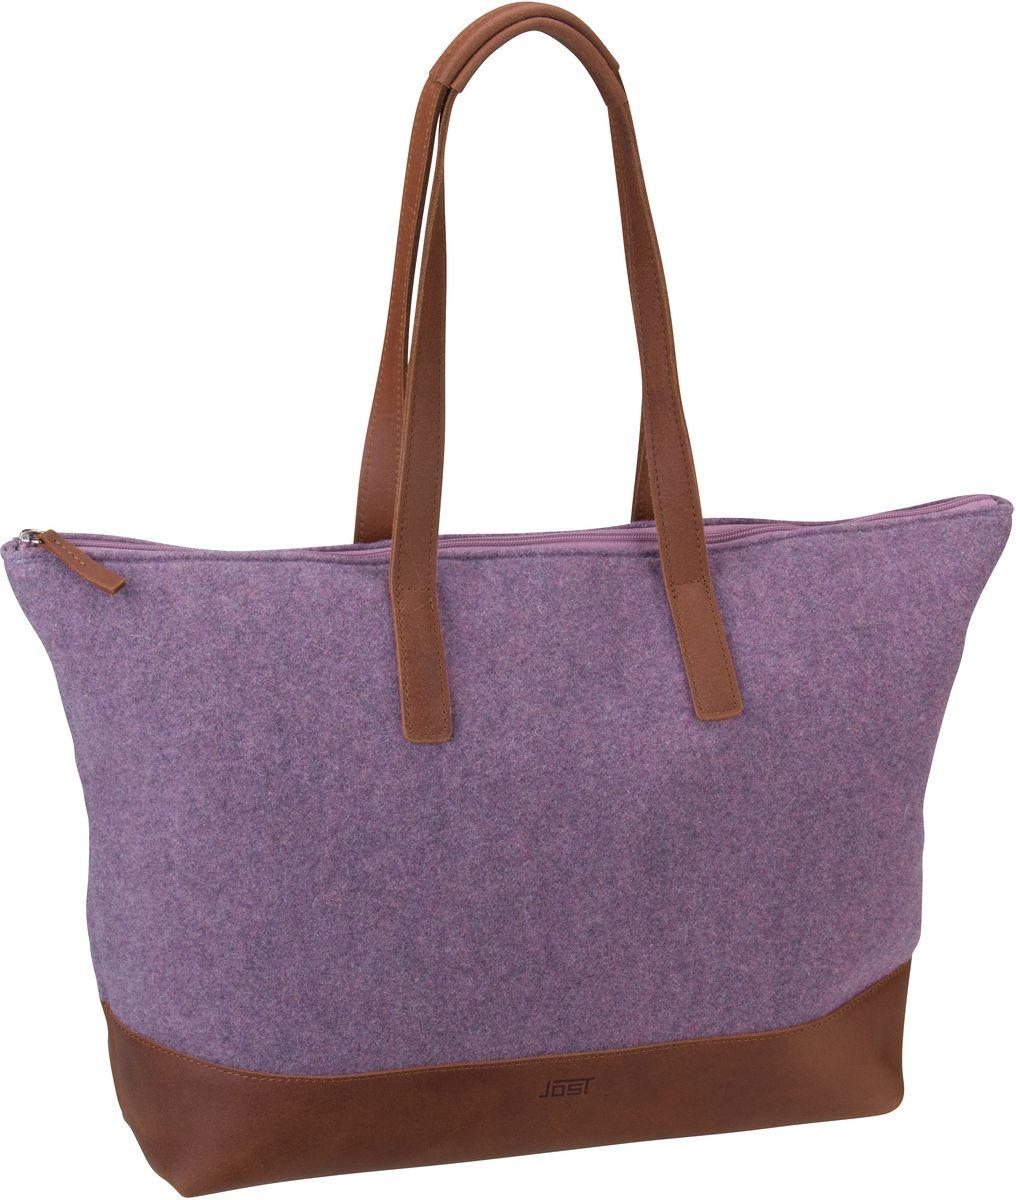 Handtasche Farum 2179 Shopper Lila